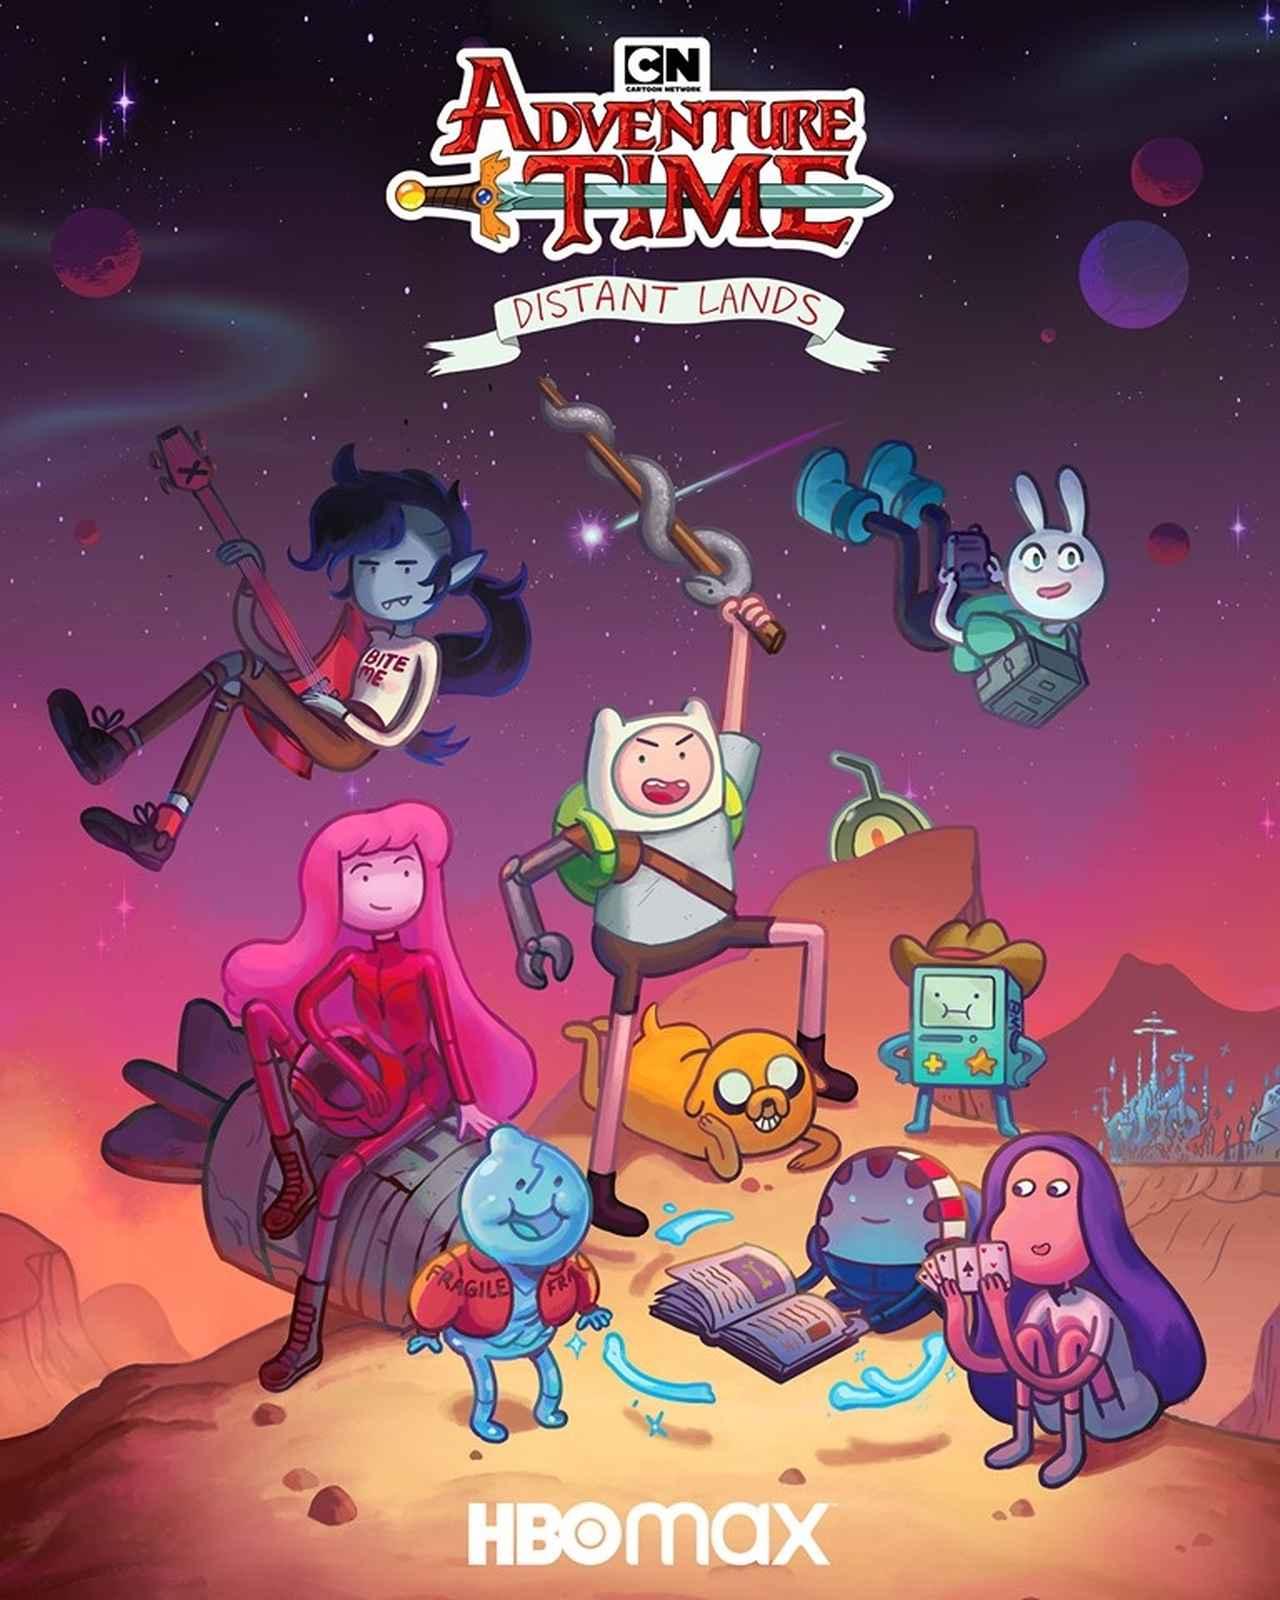 画像1: © Adventure Time/Facebook